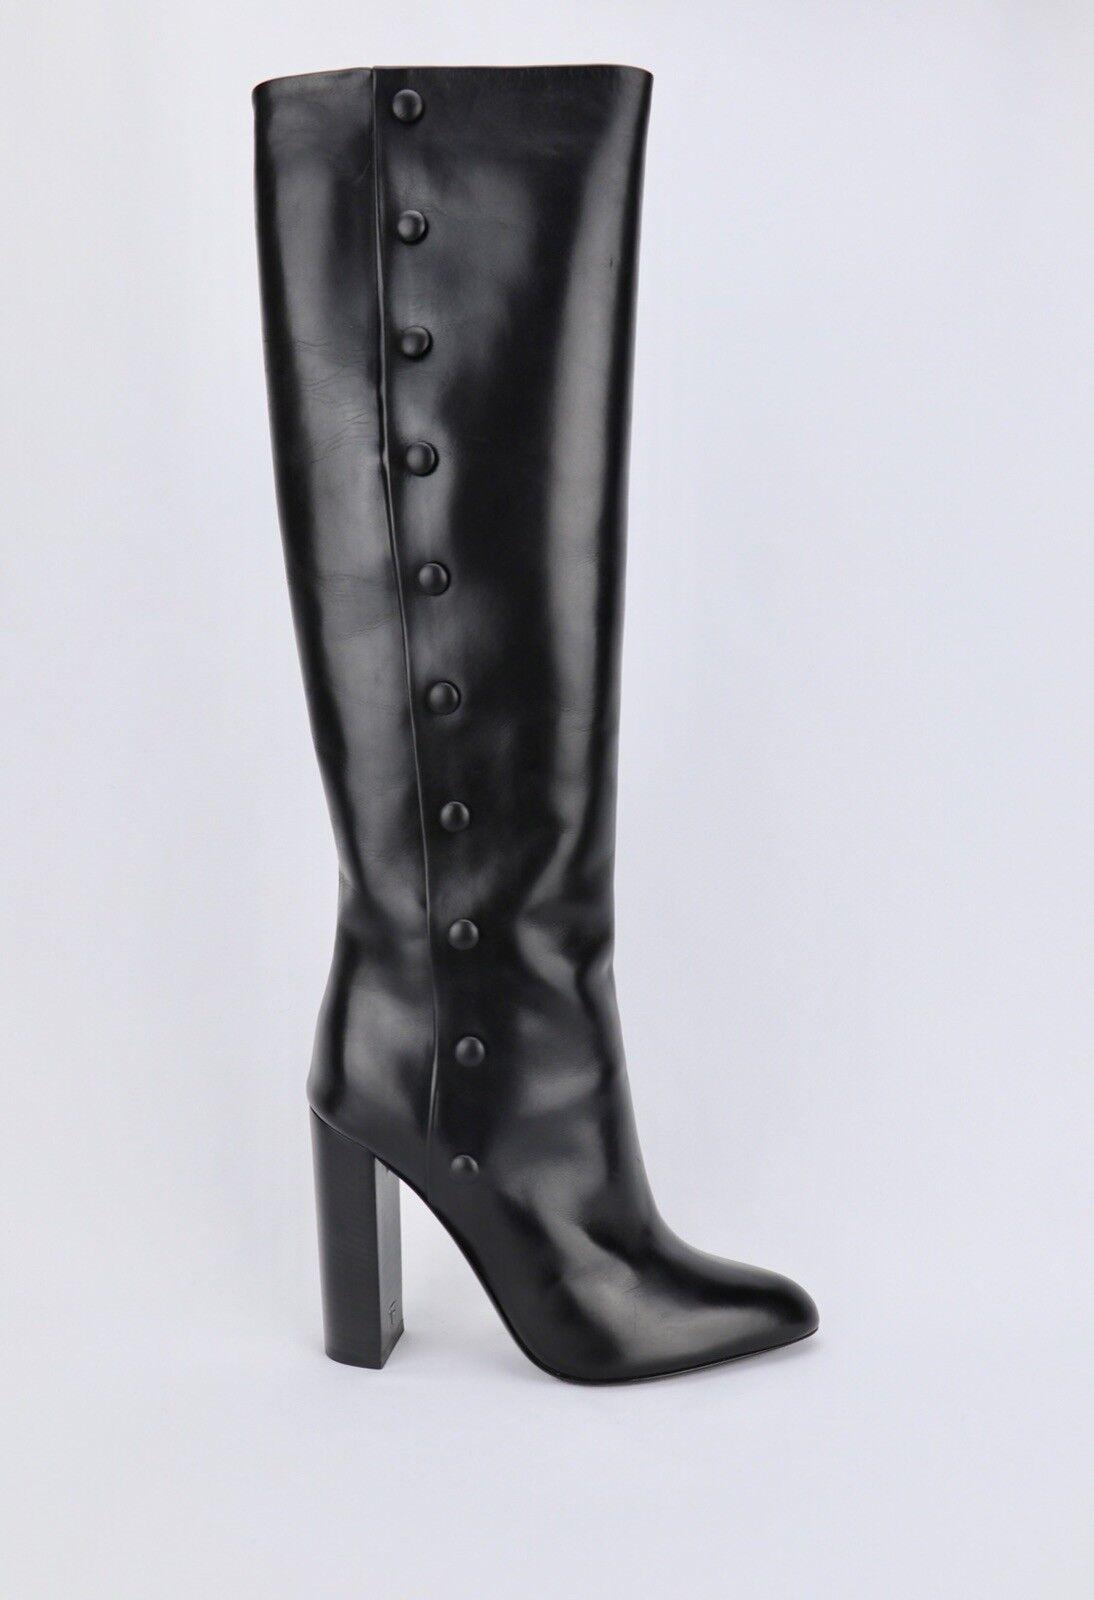 Tom Ford Women's High Heel Black Boots 8.5